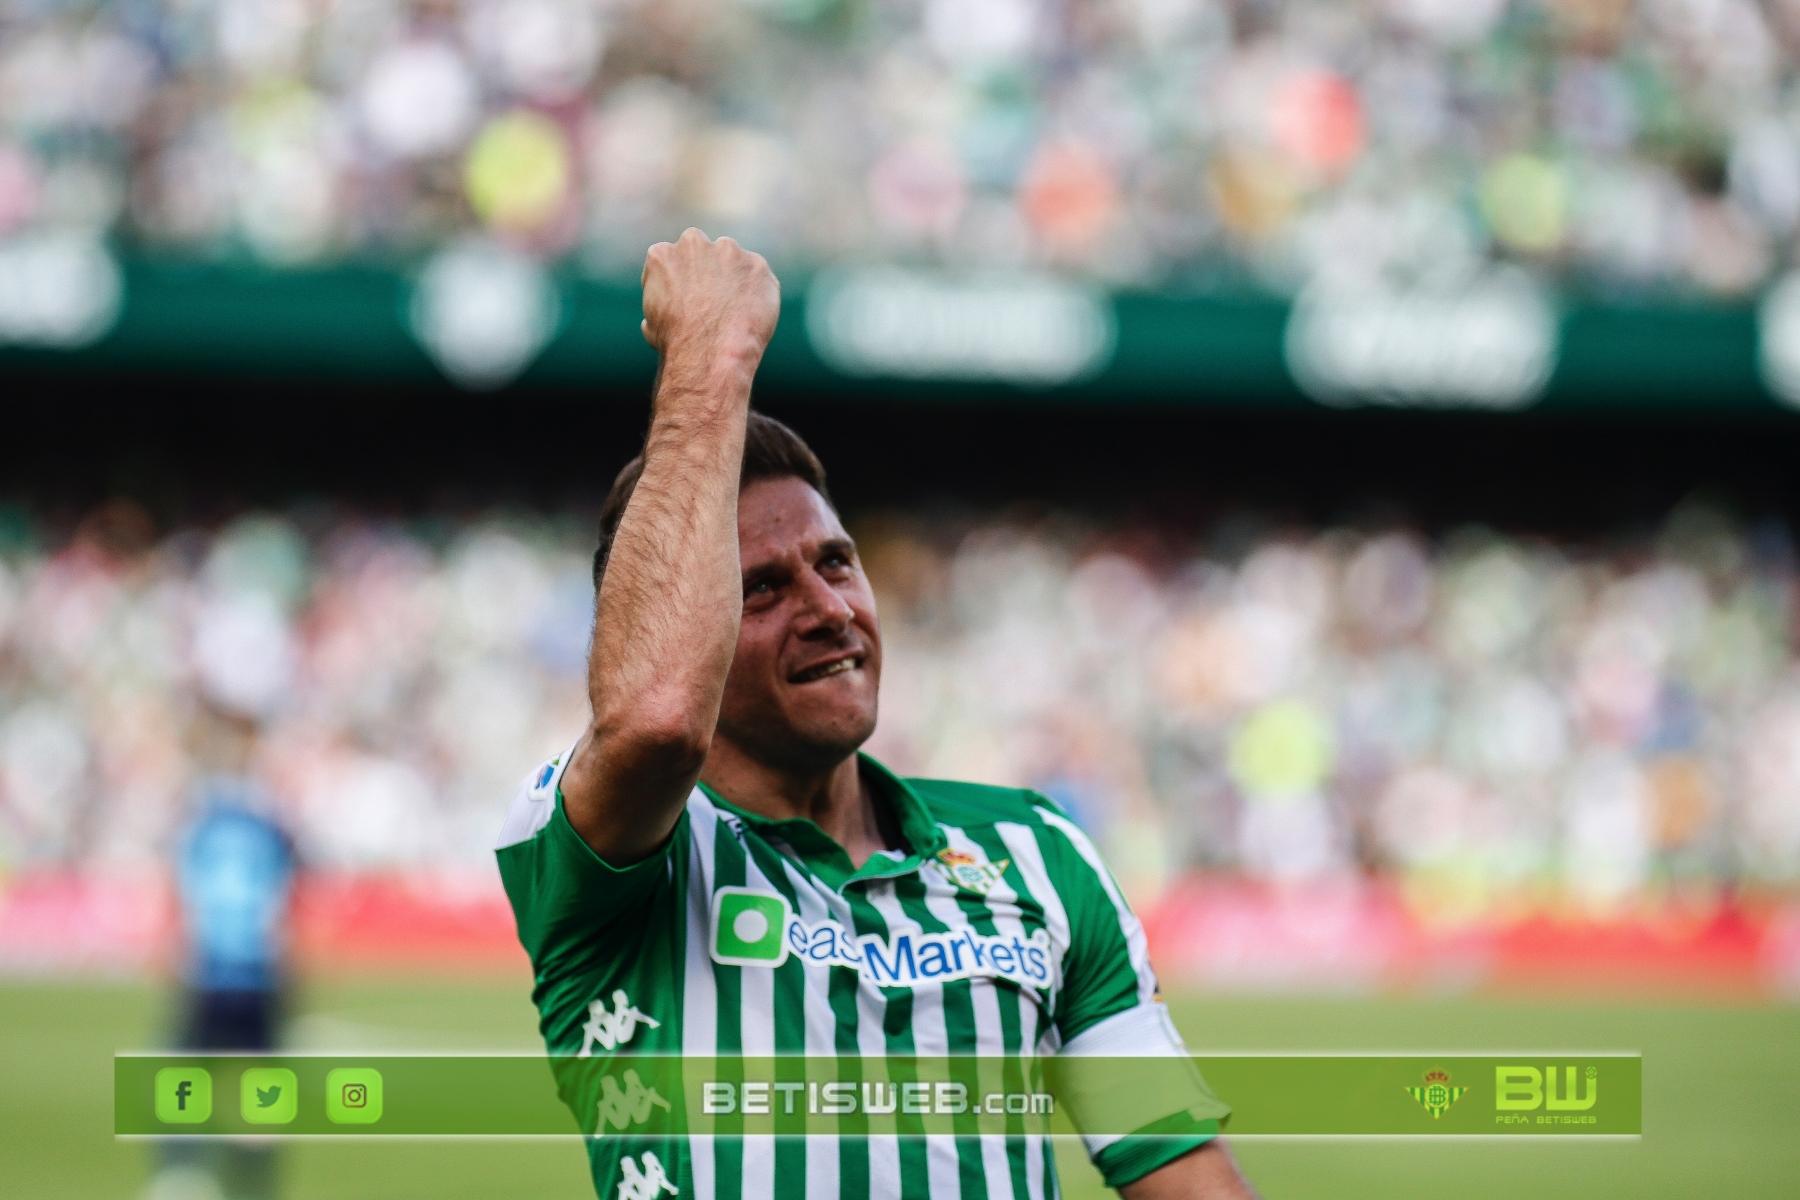 aaJ20 Real Betis - Real Sociedad 34